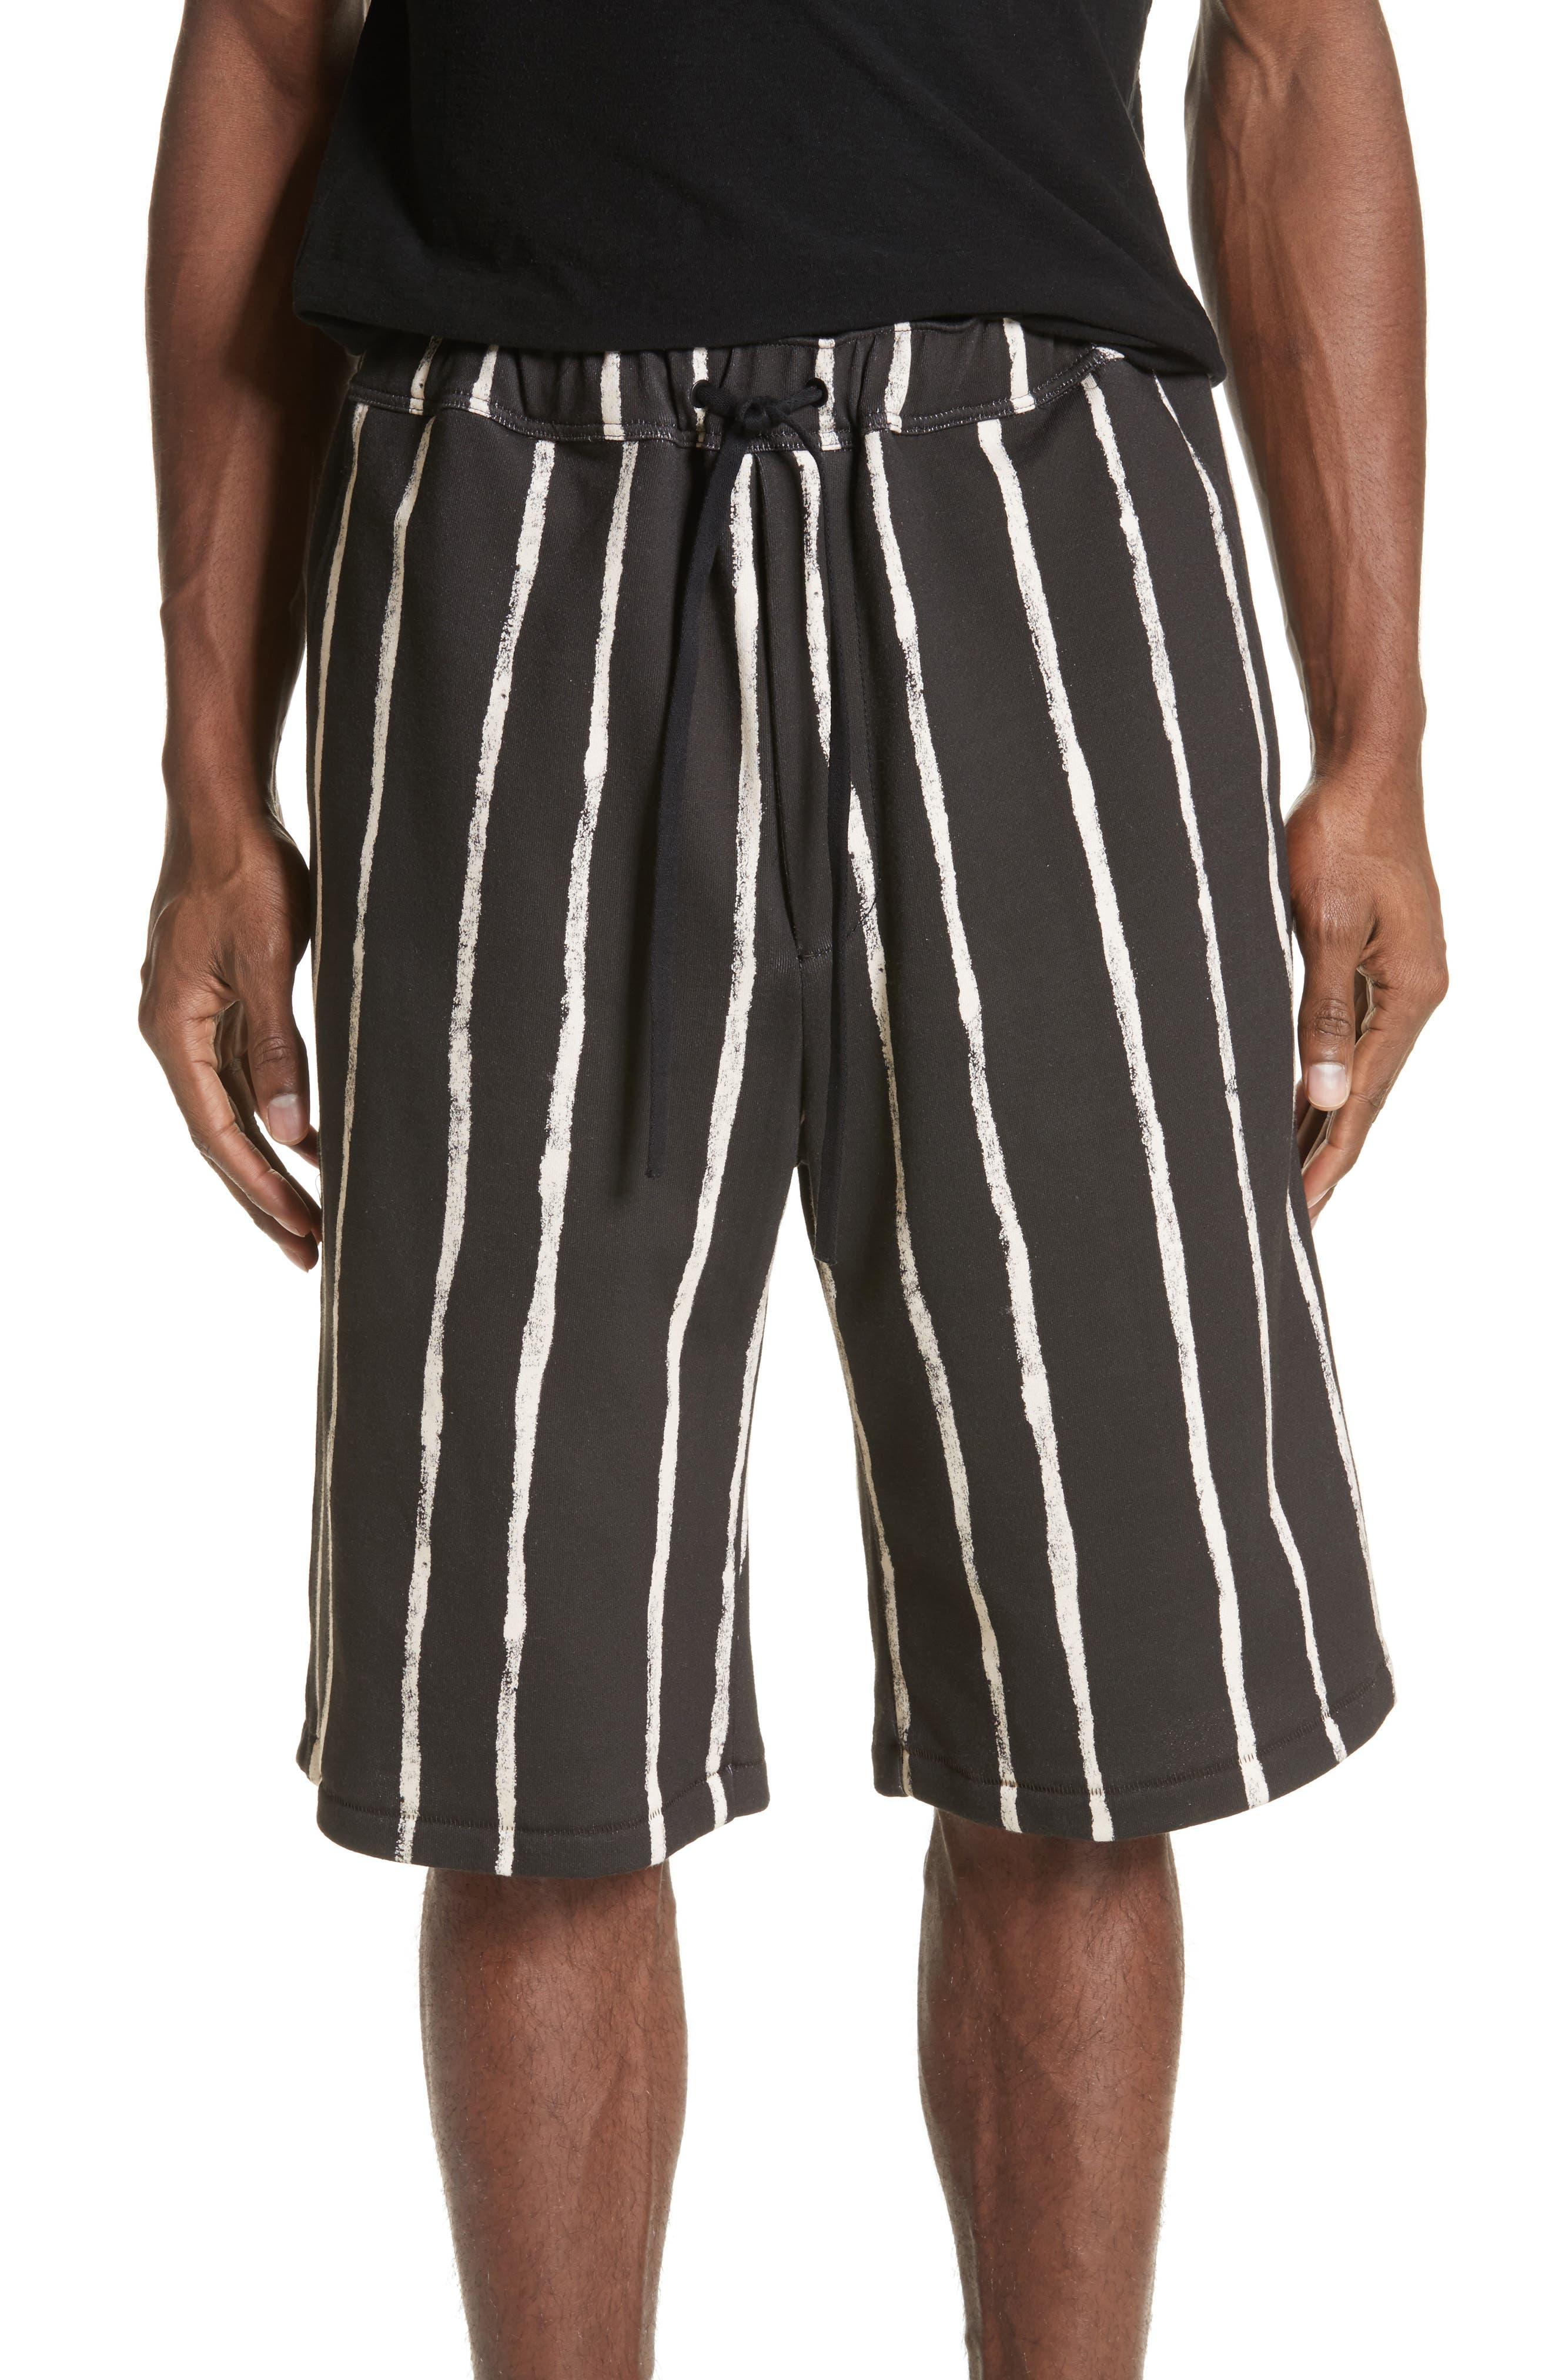 Striped Paint Shorts,                         Main,                         color, Black/ White